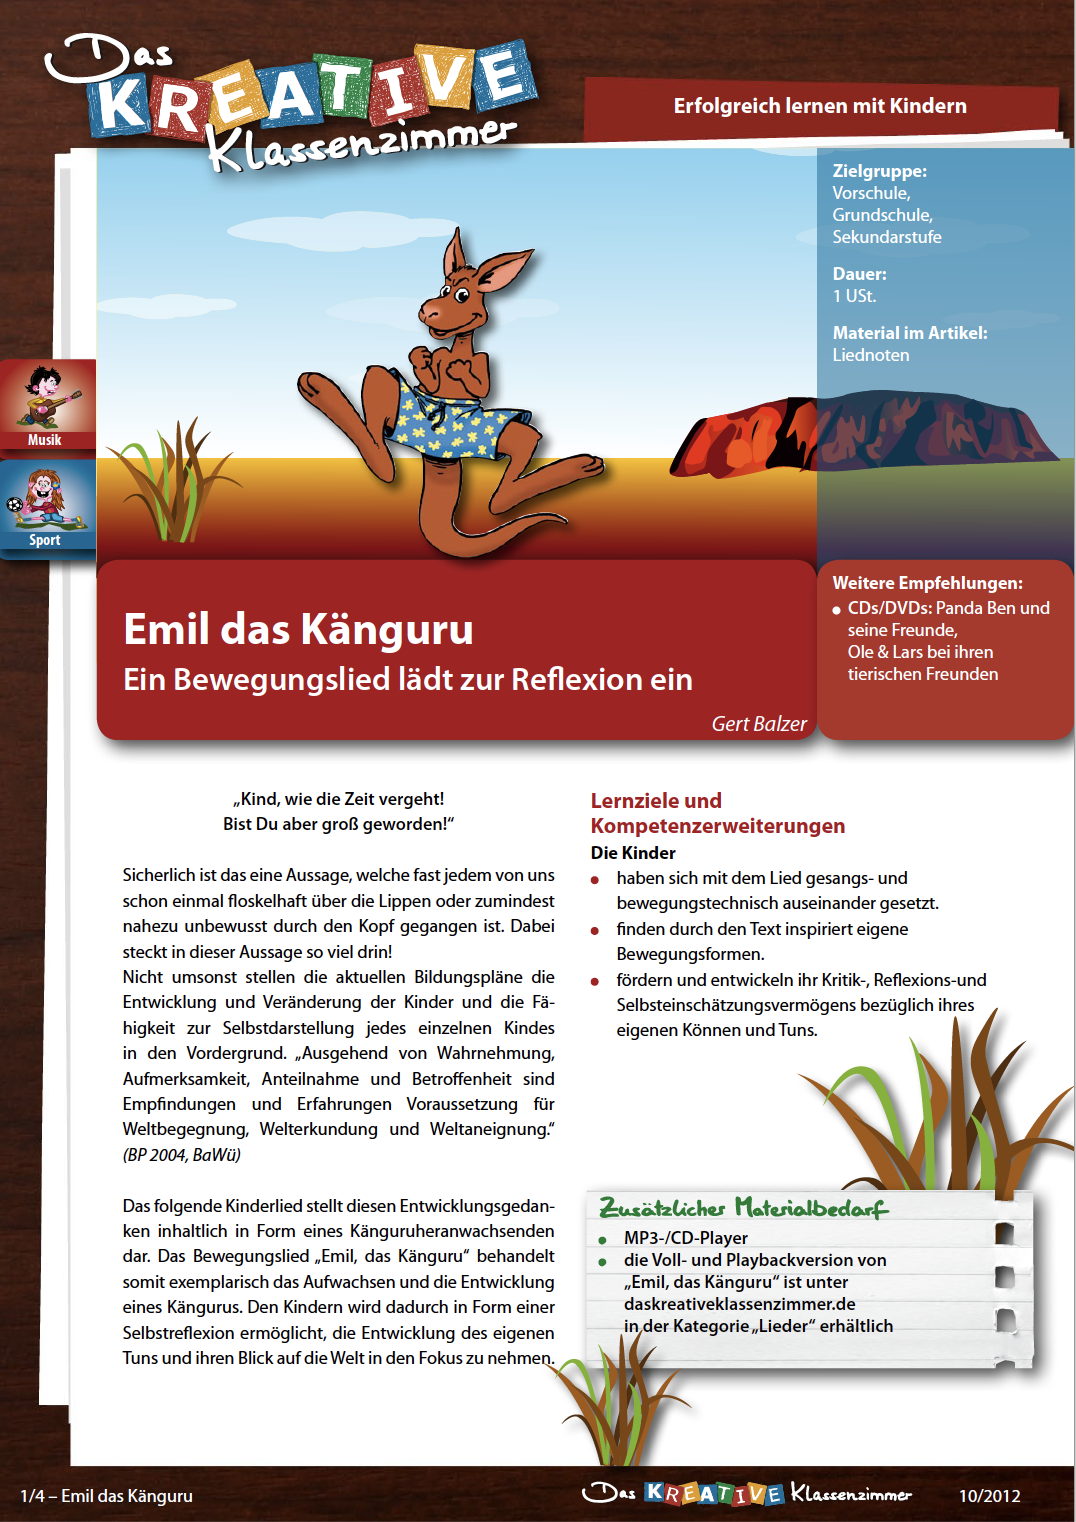 Emil das Känguru - Bewegungslied zur Selbstreflexion